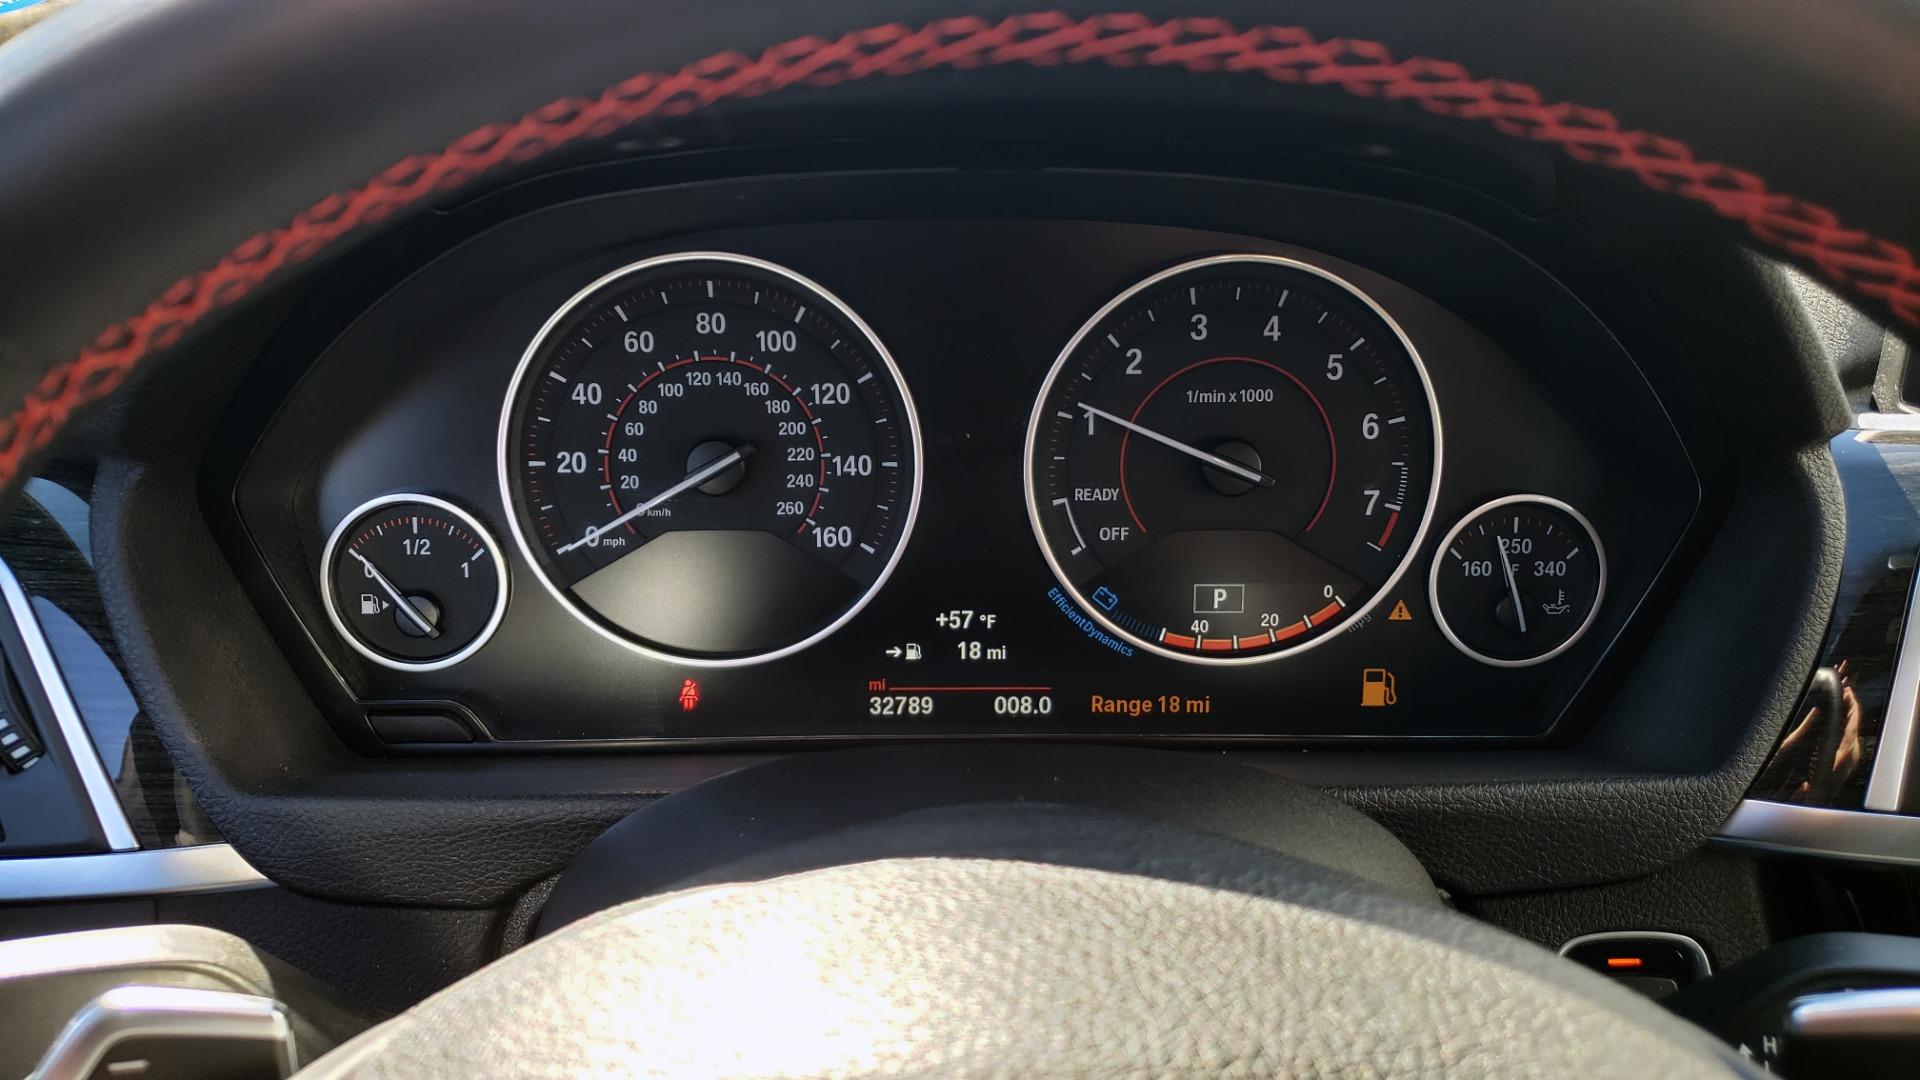 Used 2018 BMW 4 SERIES 430IXDRIVE / PREMIUM / NAV / SUNROOF / ESSENTIALS PKG for sale $27,795 at Formula Imports in Charlotte NC 28227 40